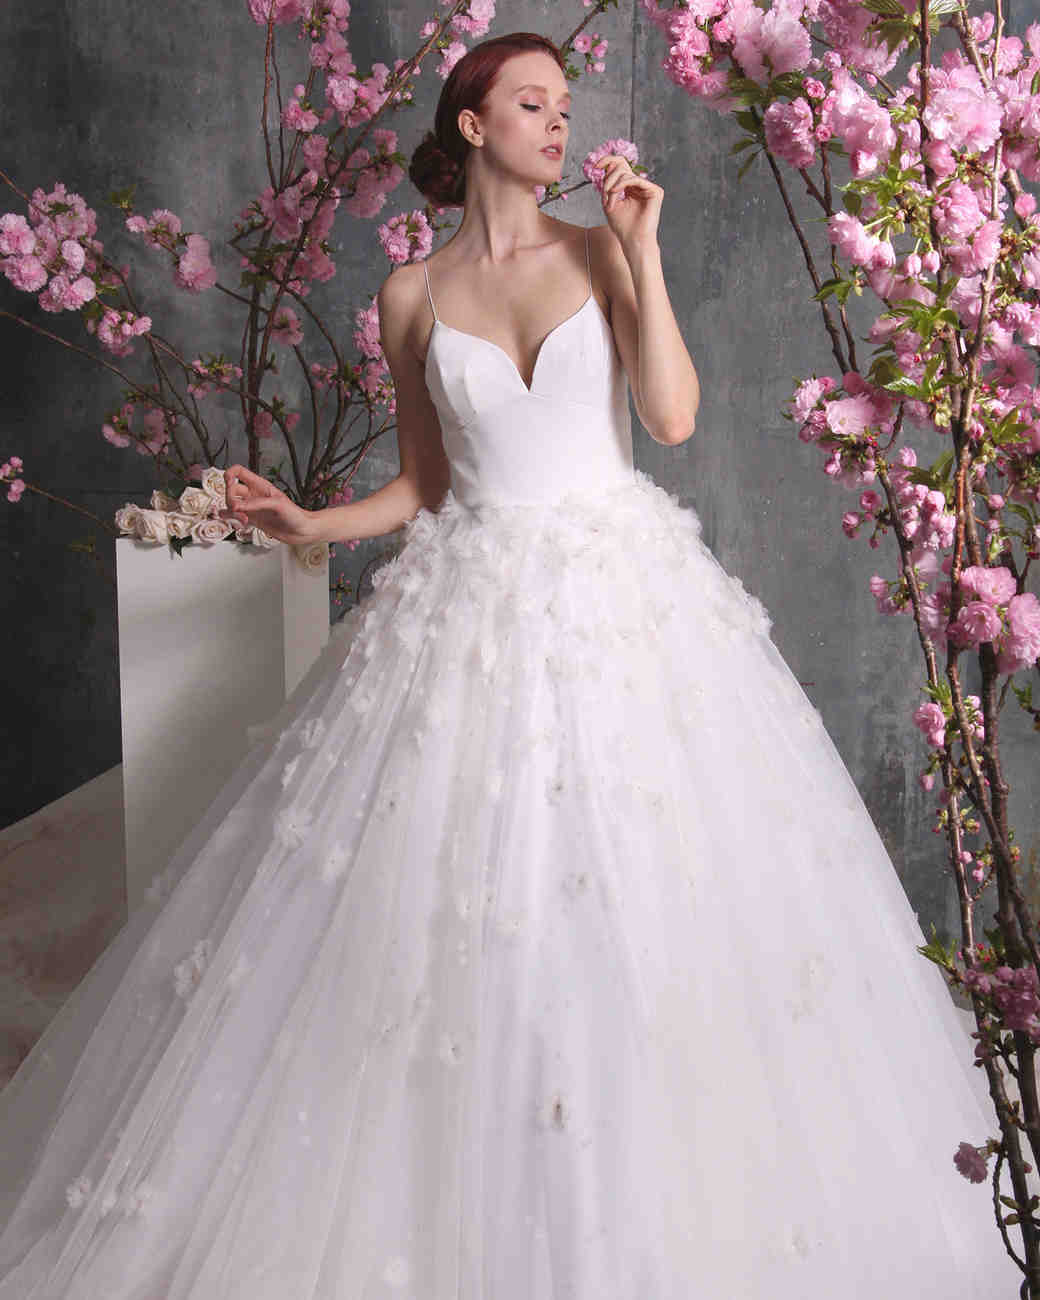 Christos wedding dresses 2018 summer best dresses collection for Summer style wedding dresses